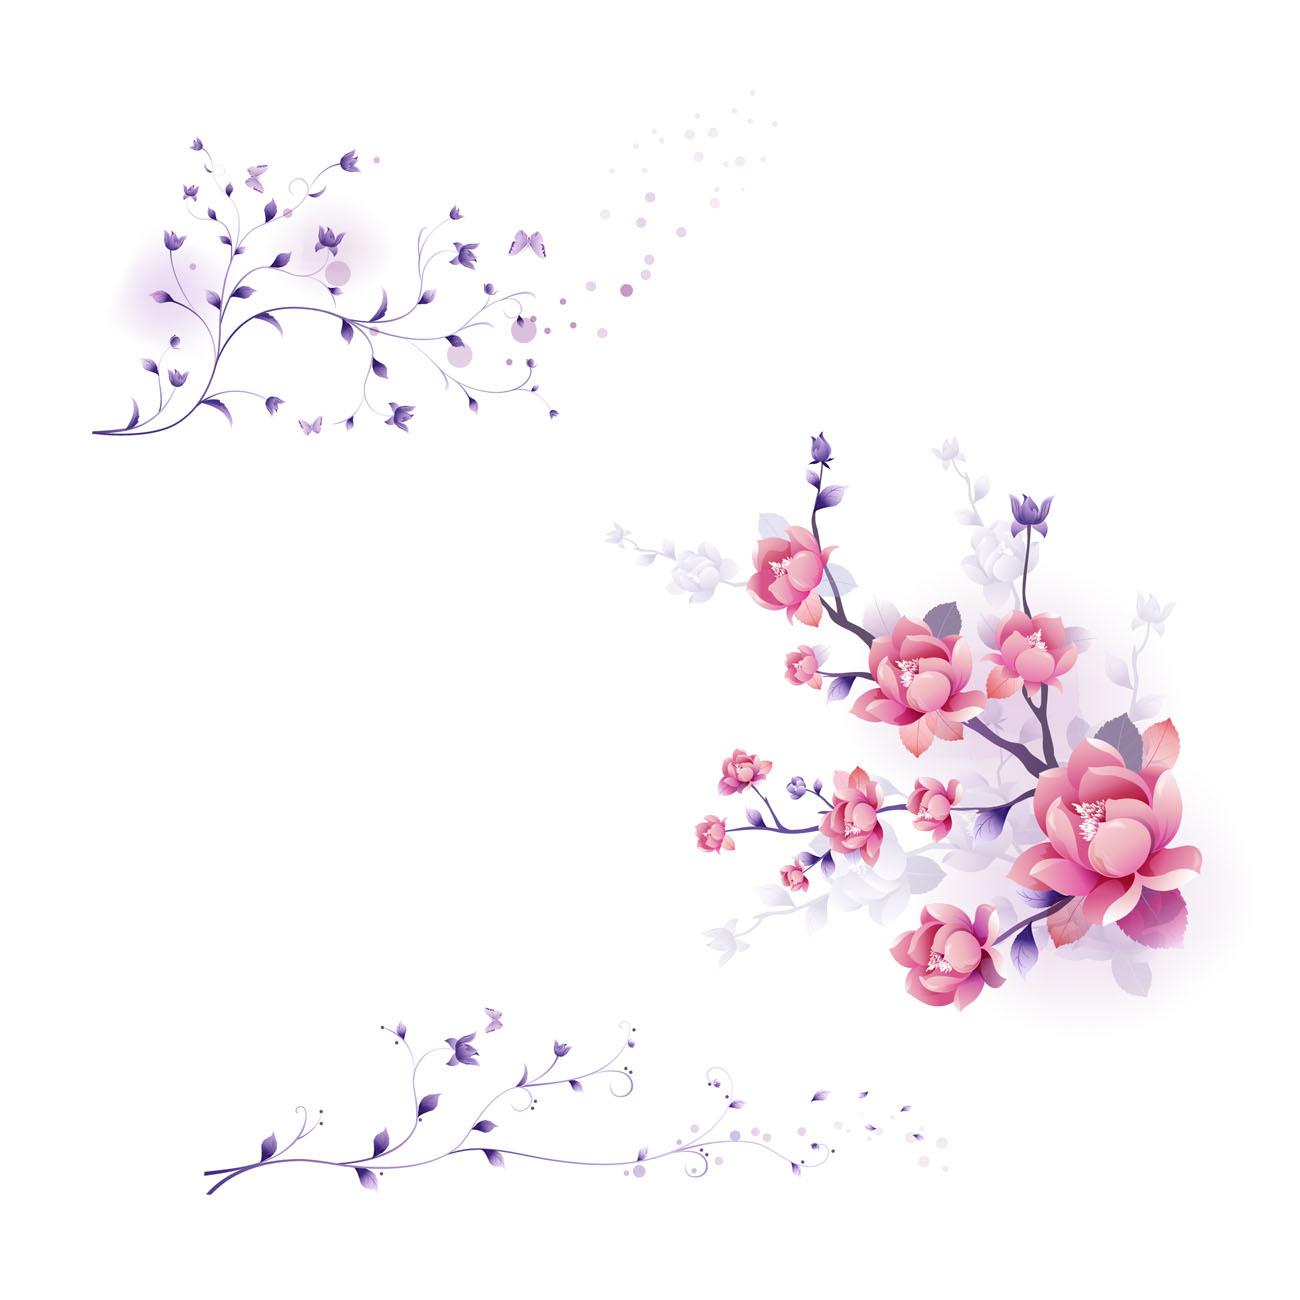 Free Vector Art Graphics Flowers on Free Flower Vector Art